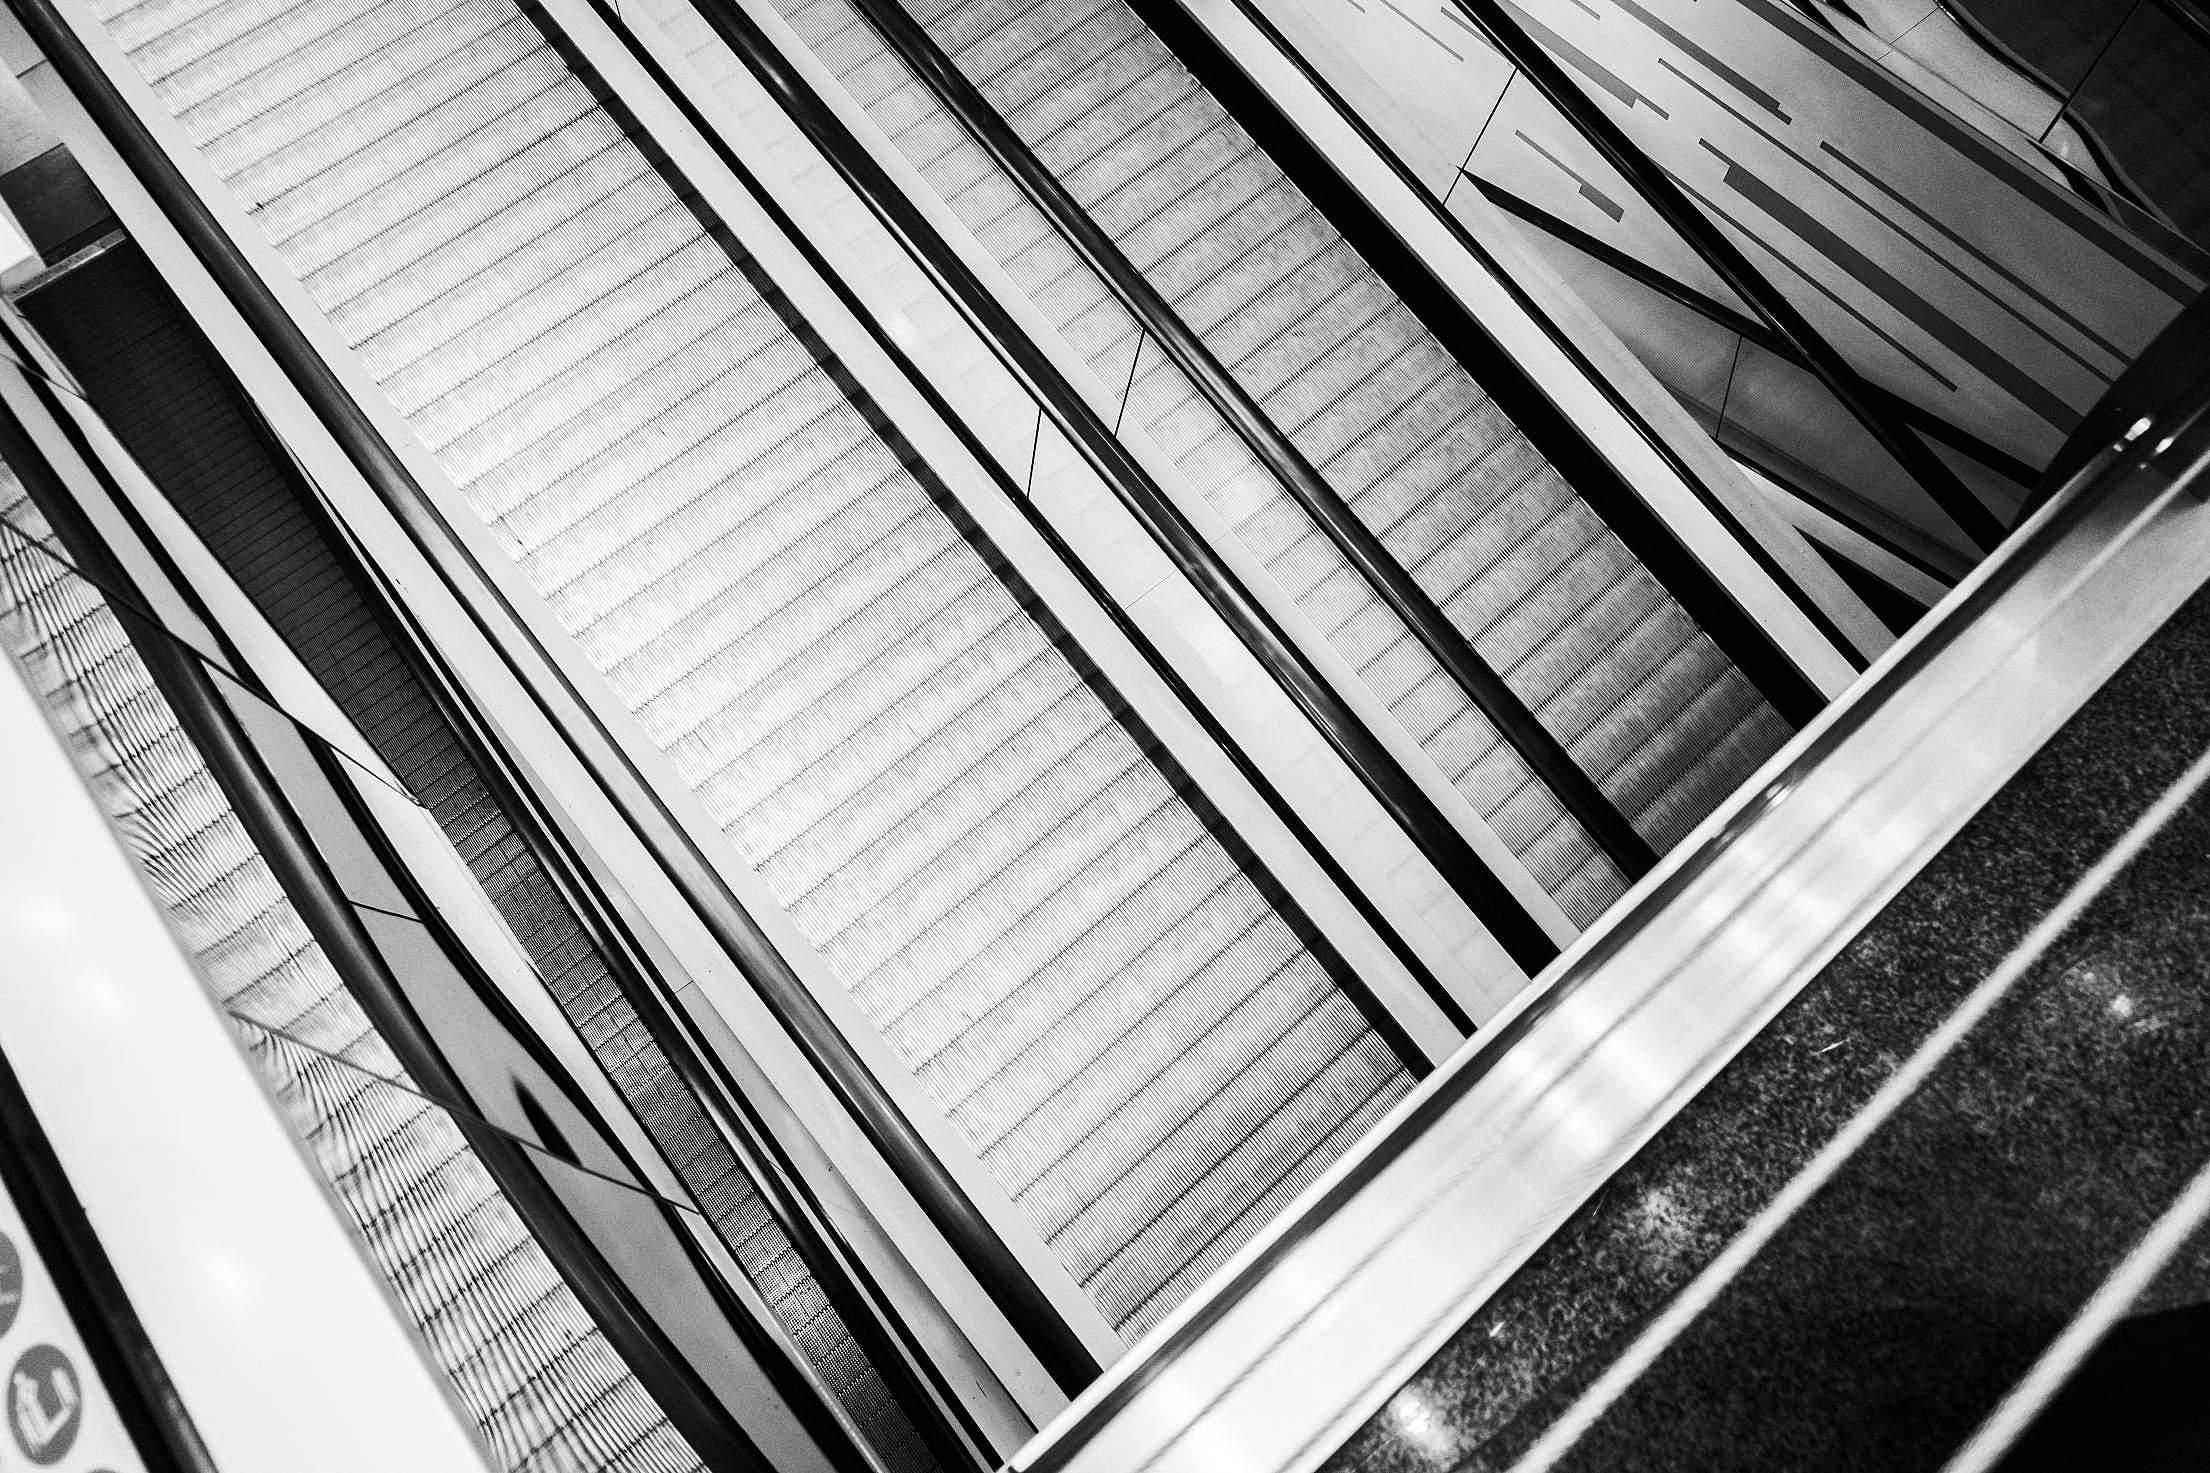 Abstract Black and White Geometric Background (Escalators) #2 Free Stock Photo